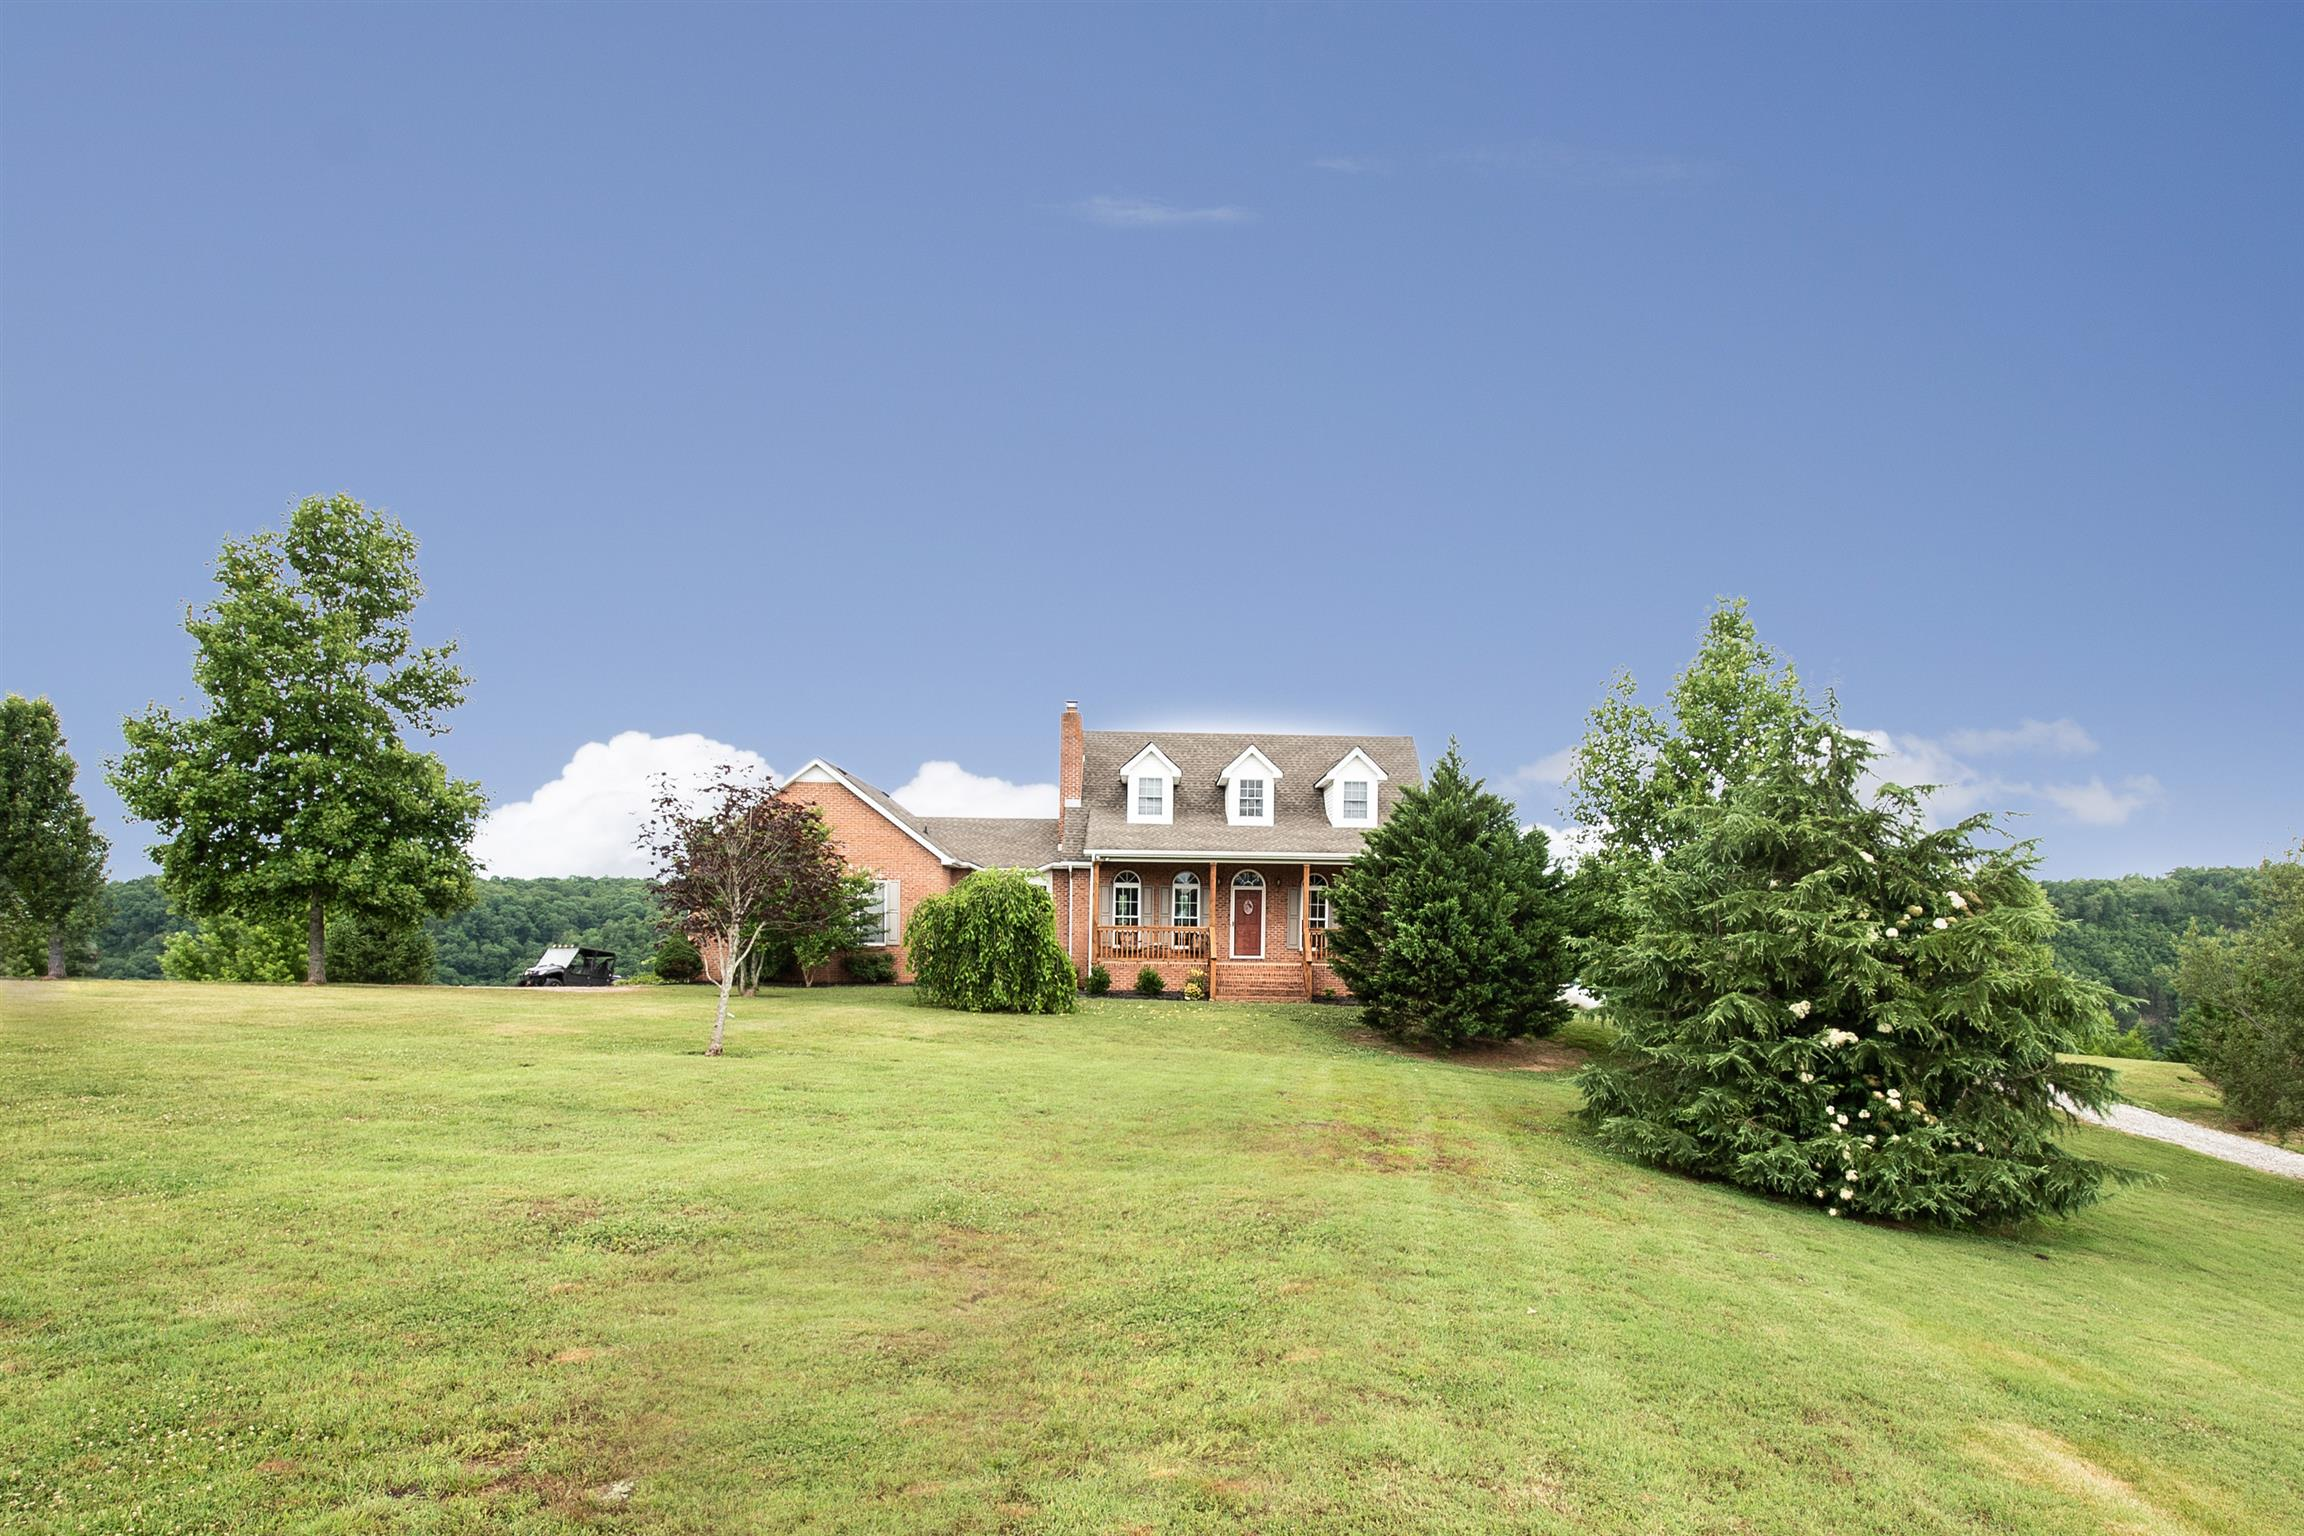 1113 Potts Camps Rd, Smithville, TN 37166 - Smithville, TN real estate listing